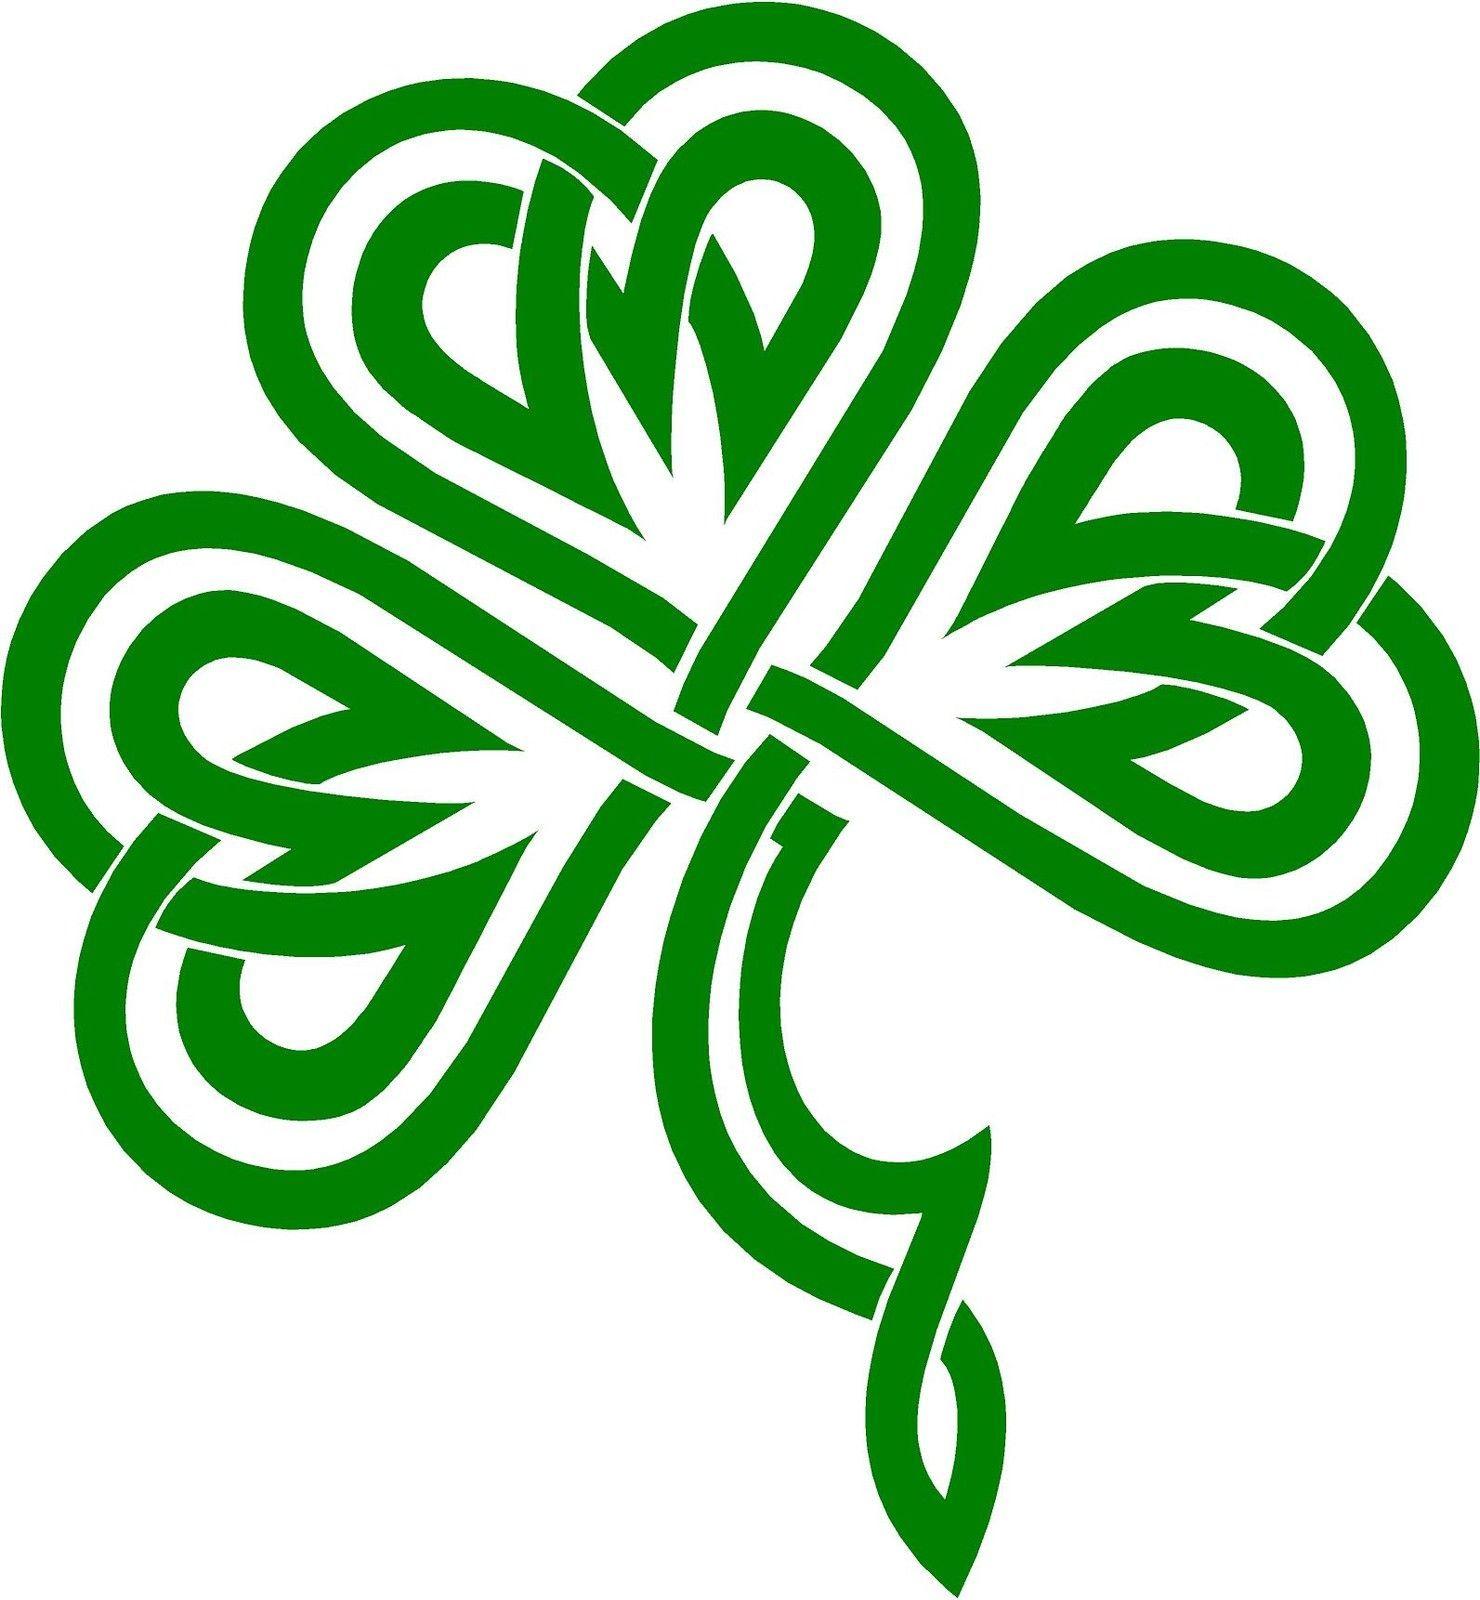 Celtic clover irish clover shamrock celtic knot decal sticker celtic clover irish clover shamrock celtic knot decal sticker you pick color biocorpaavc Gallery